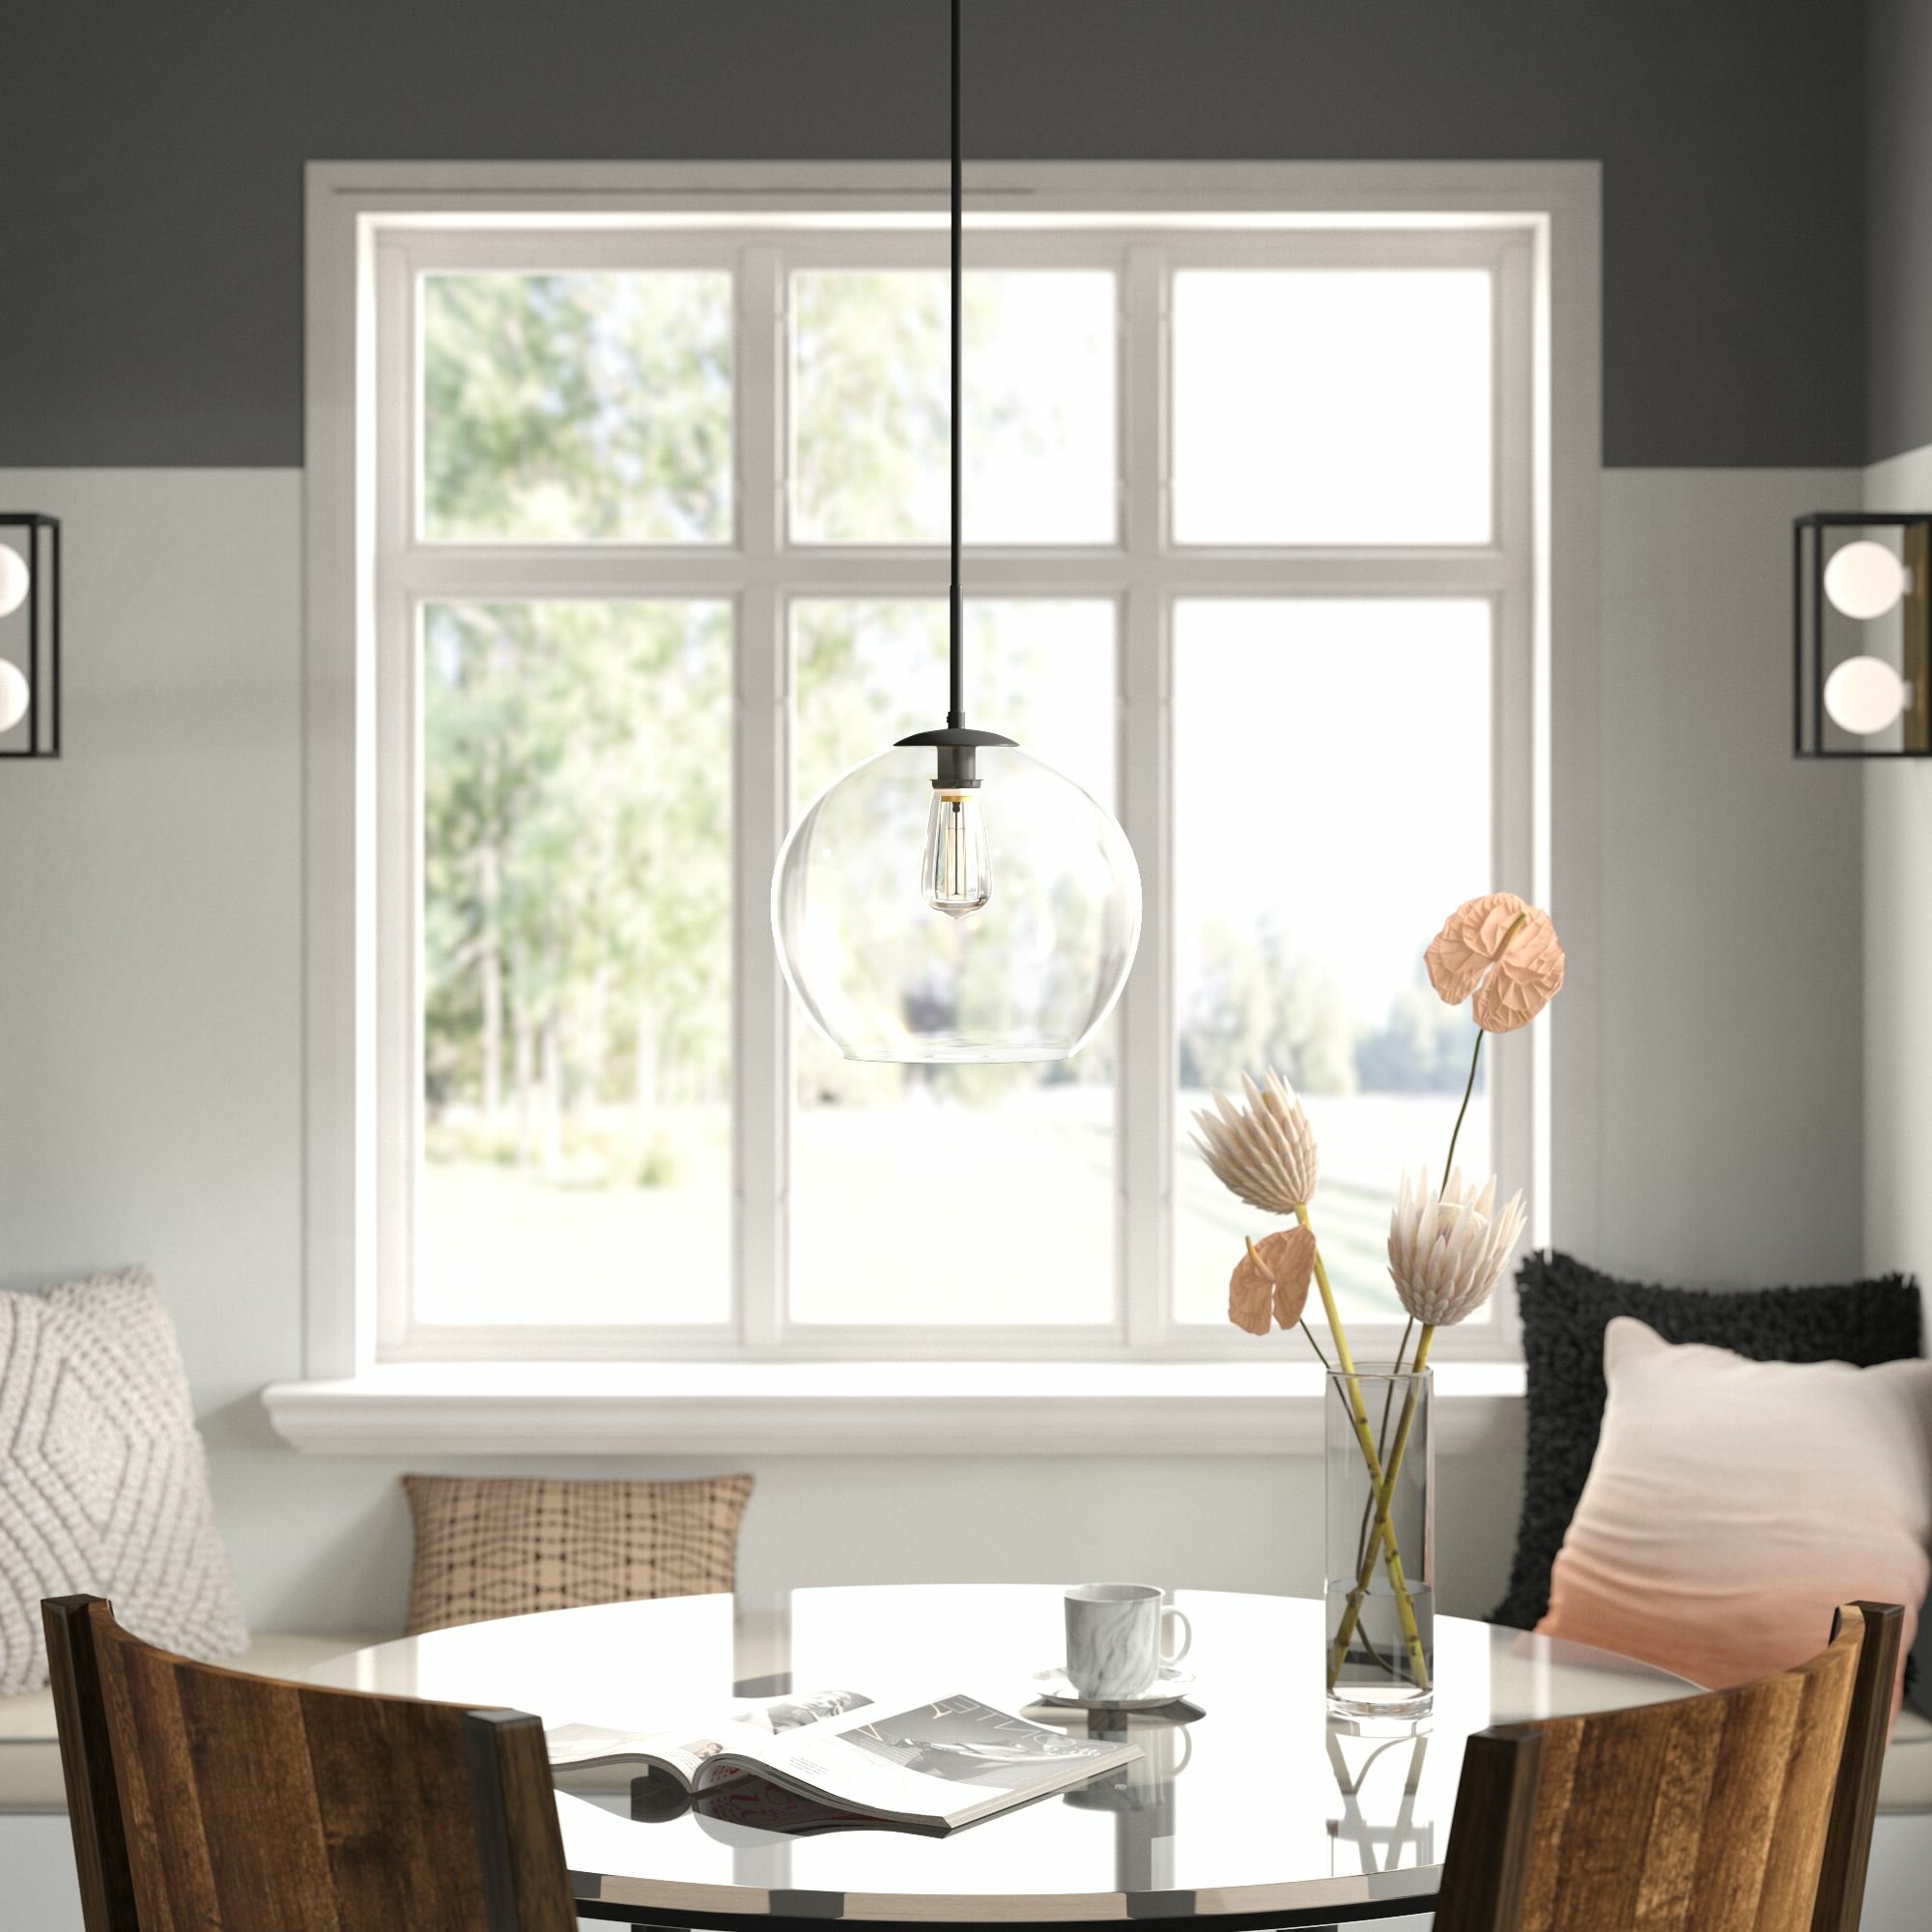 Devereaux 1 Light Single Globe Pendants Intended For Favorite Round Glass Pendant Light You'll Love In (View 15 of 20)